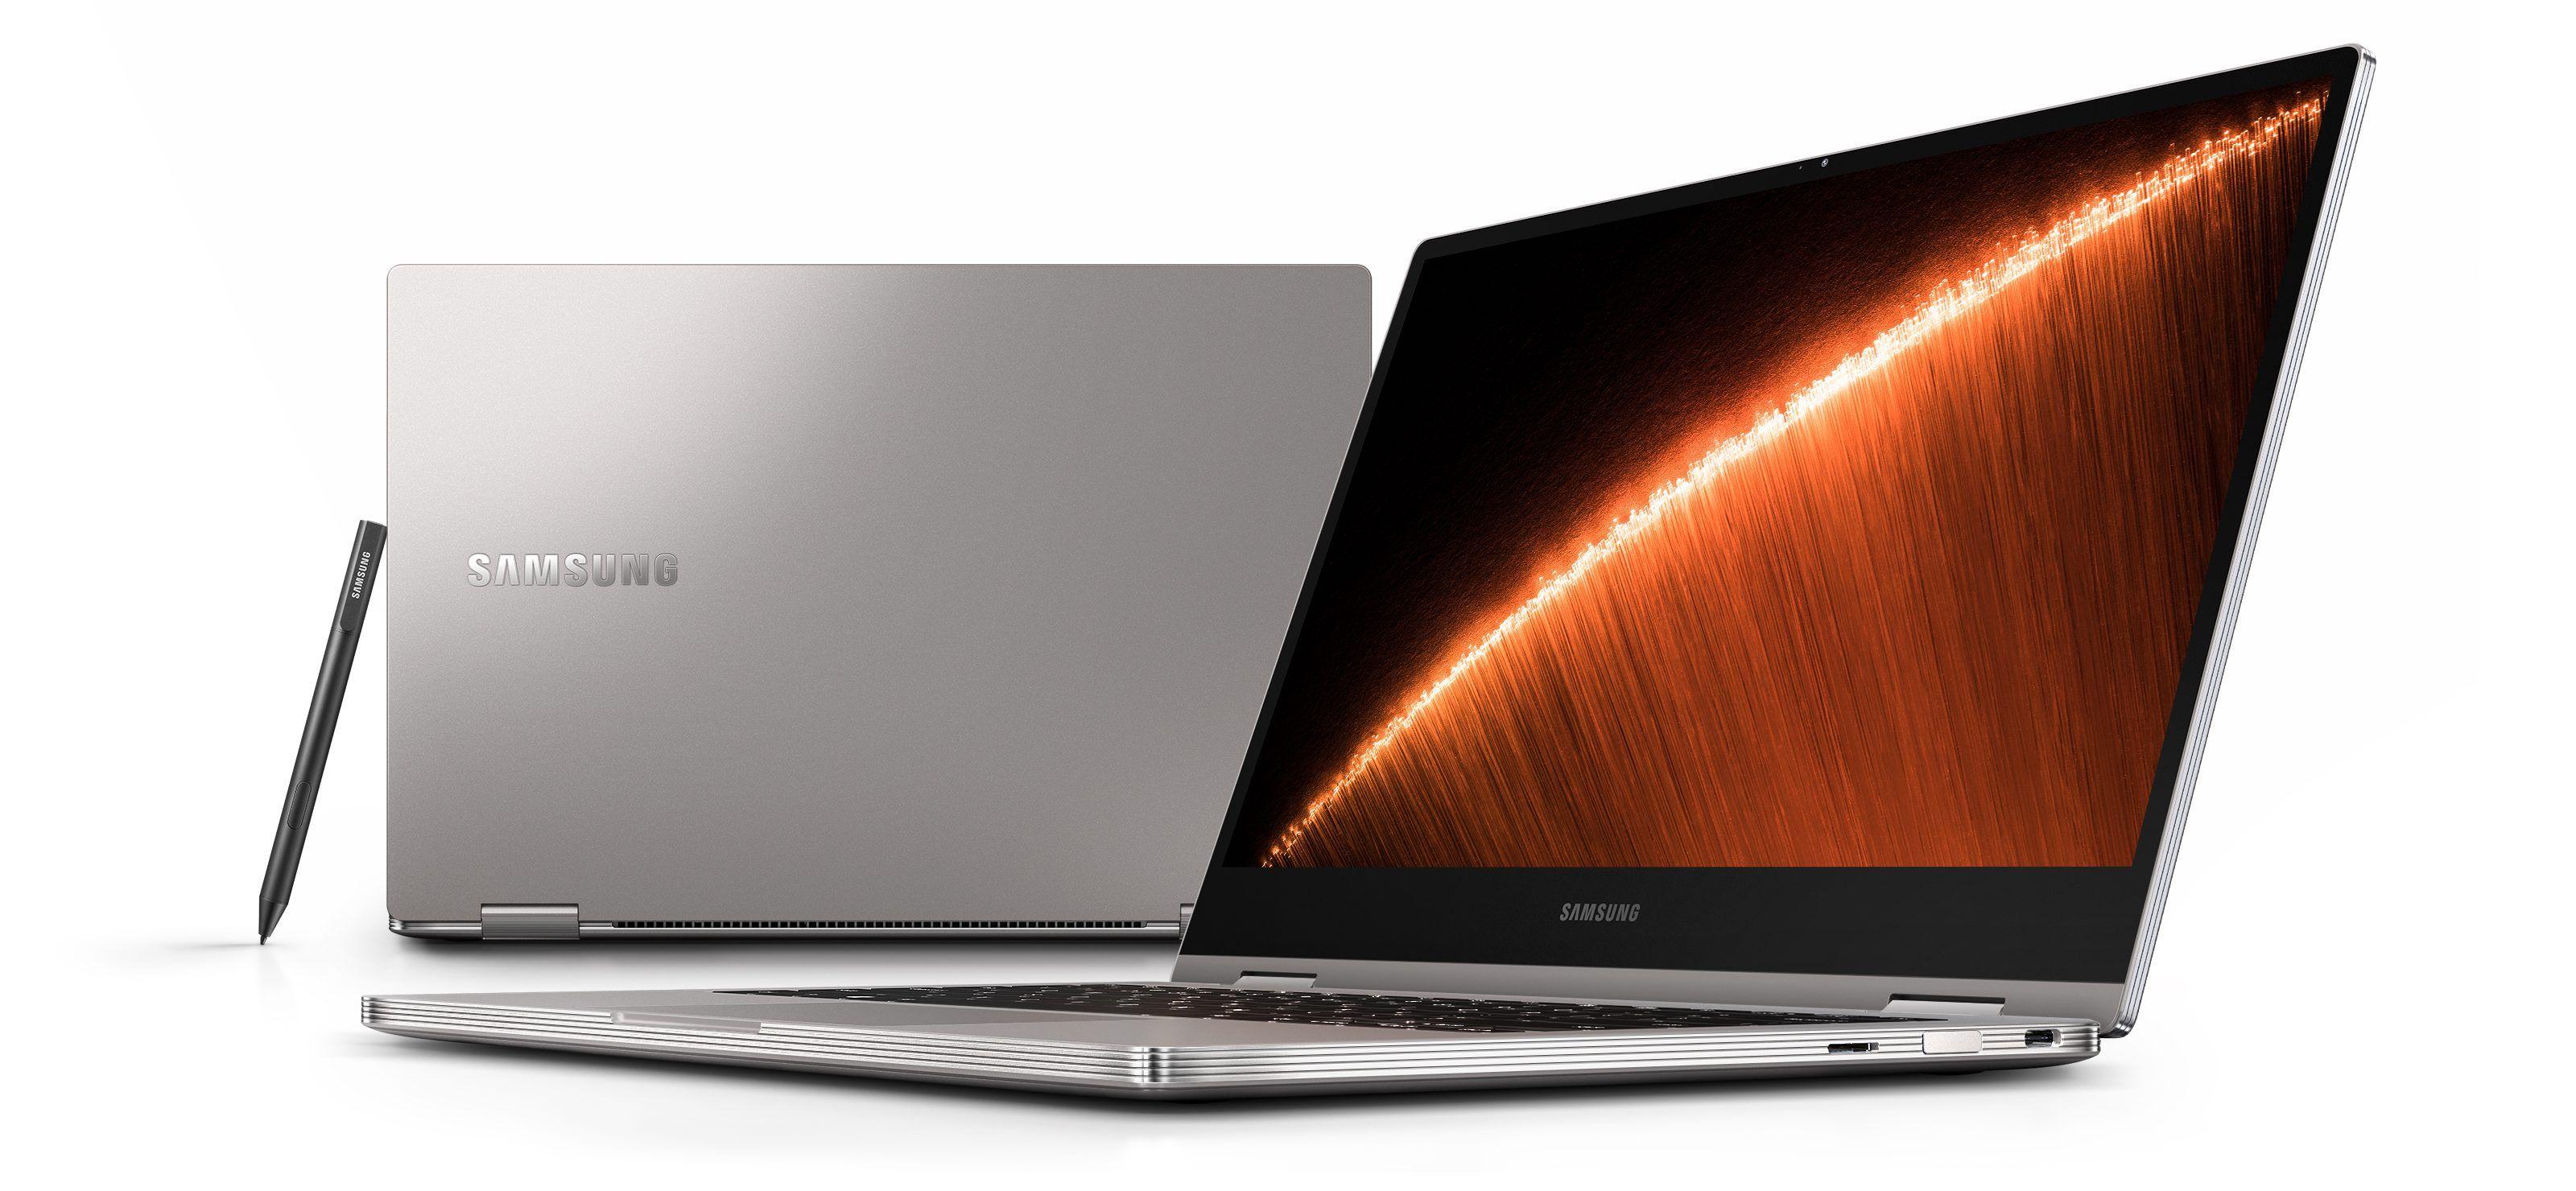 Samsung releases a Chromebooklike Windows 10 Home laptop